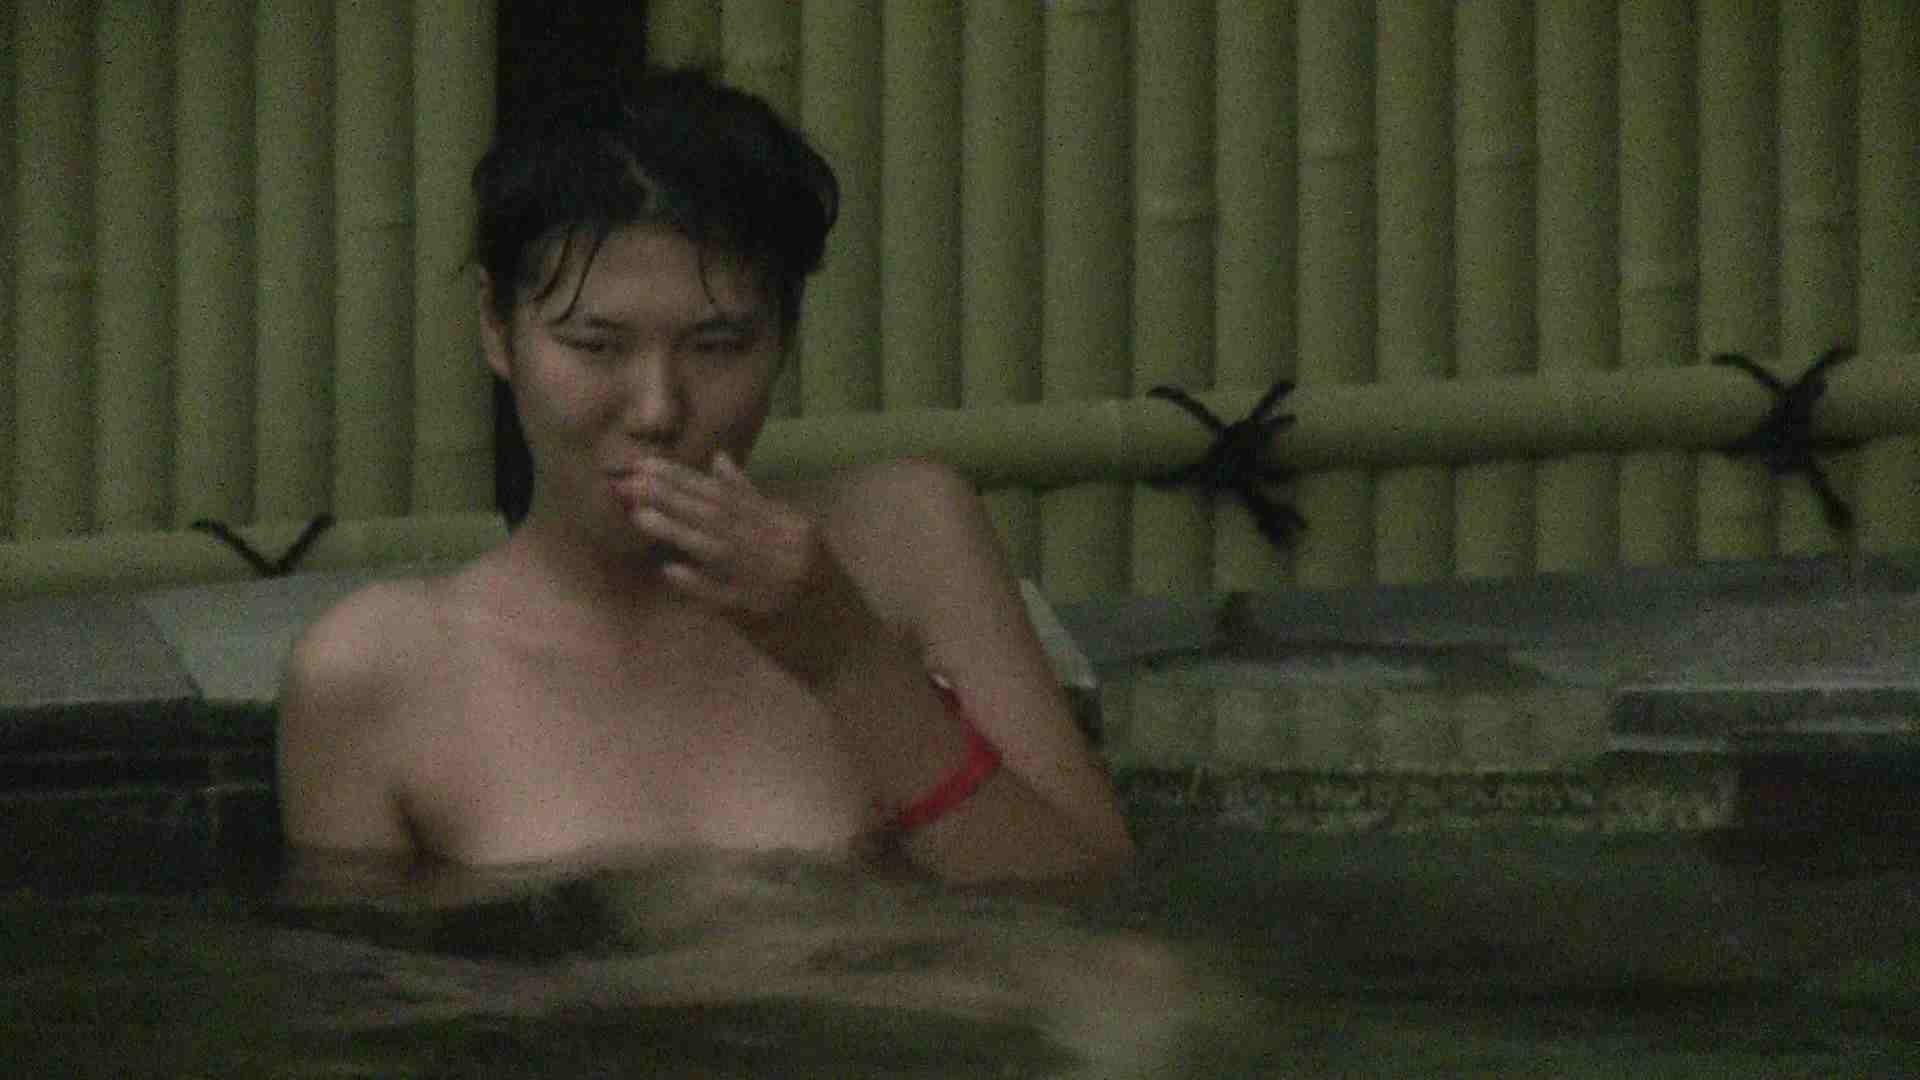 Aquaな露天風呂Vol.215 女体盗撮 盗撮戯れ無修正画像 74連発 35